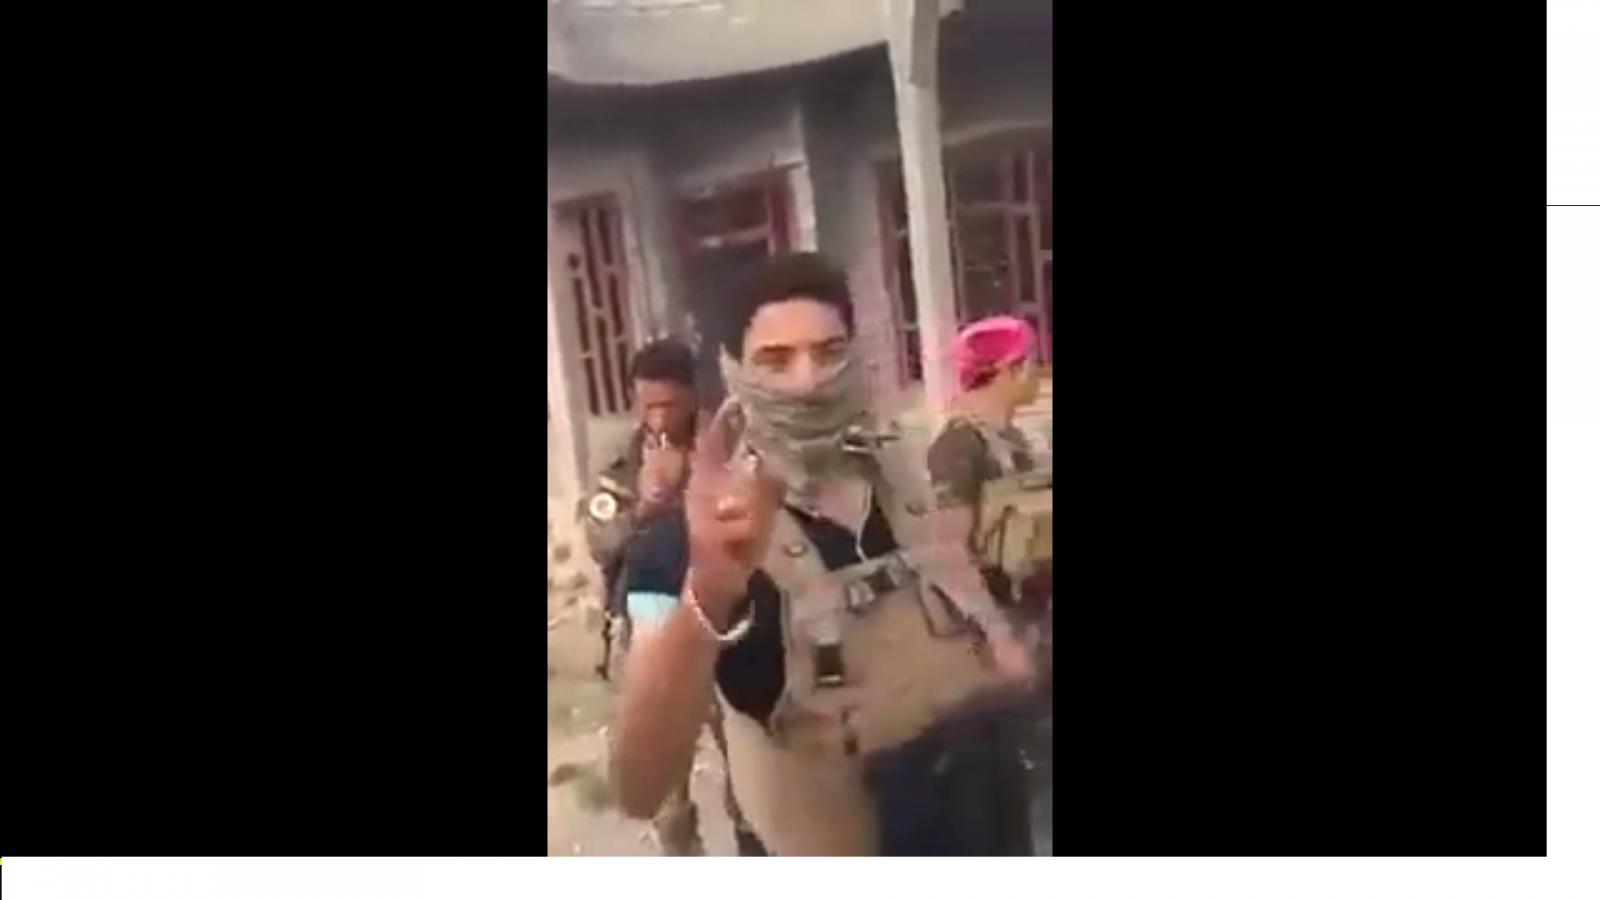 Shia atrocity video